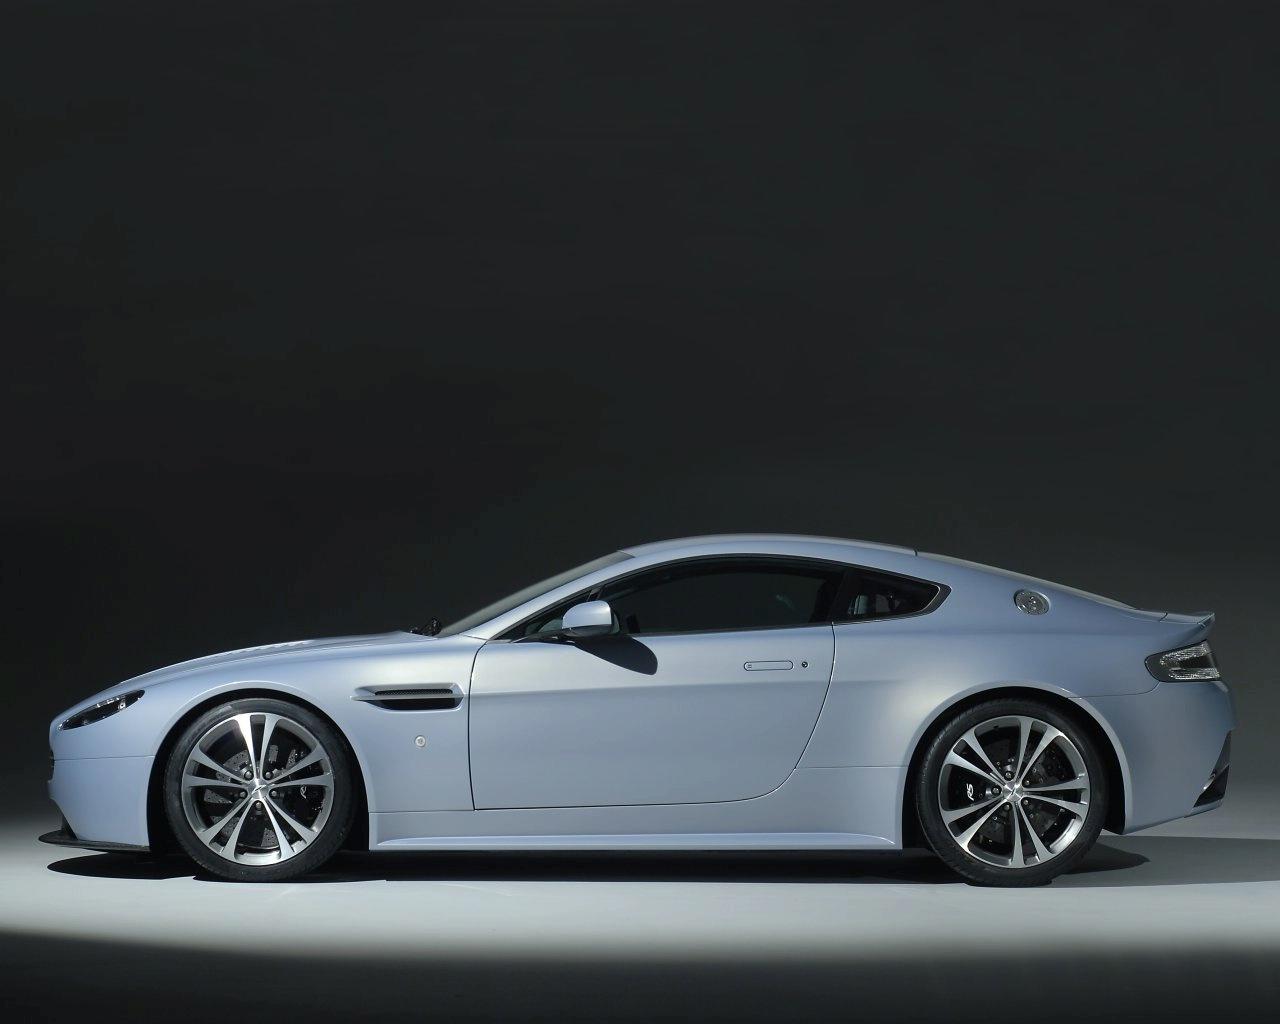 http://images.caradisiac.com/images/1/2/8/4/21284/S0-Aston-Martin-V12-Vantage-RS-Concept-la-future-bombe-anglaise-est-officielle-91410.jpg